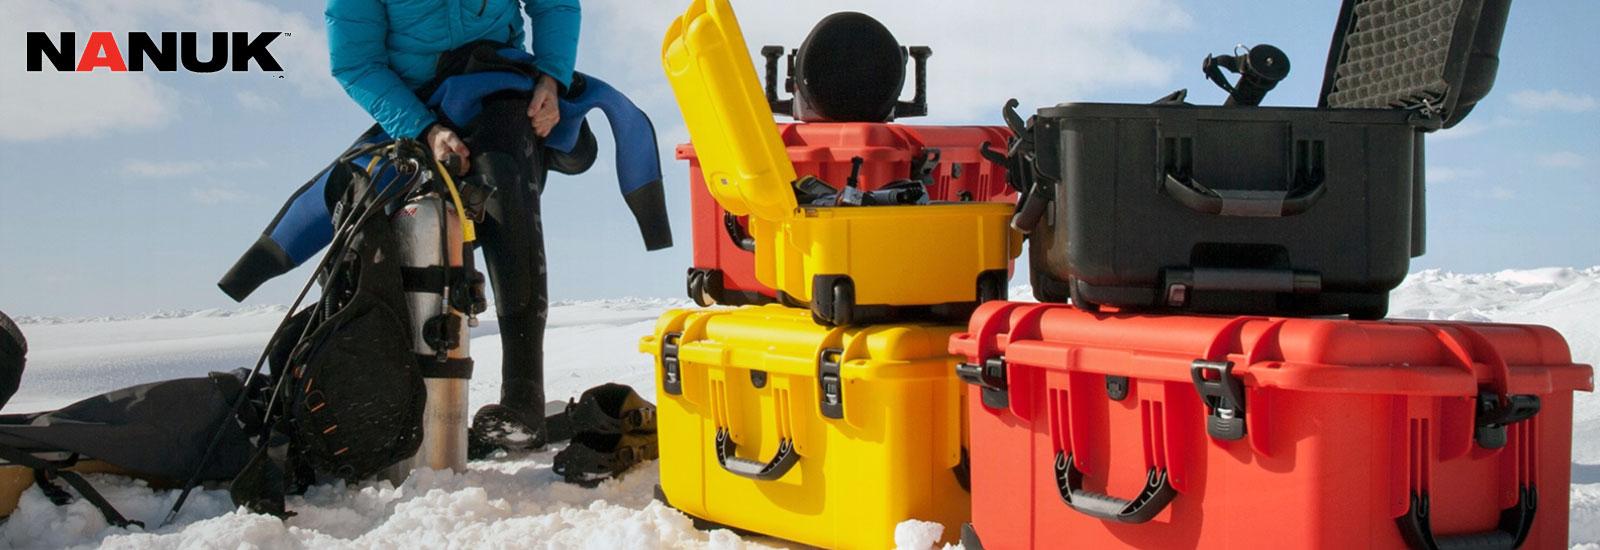 Premium Waterproof Cases